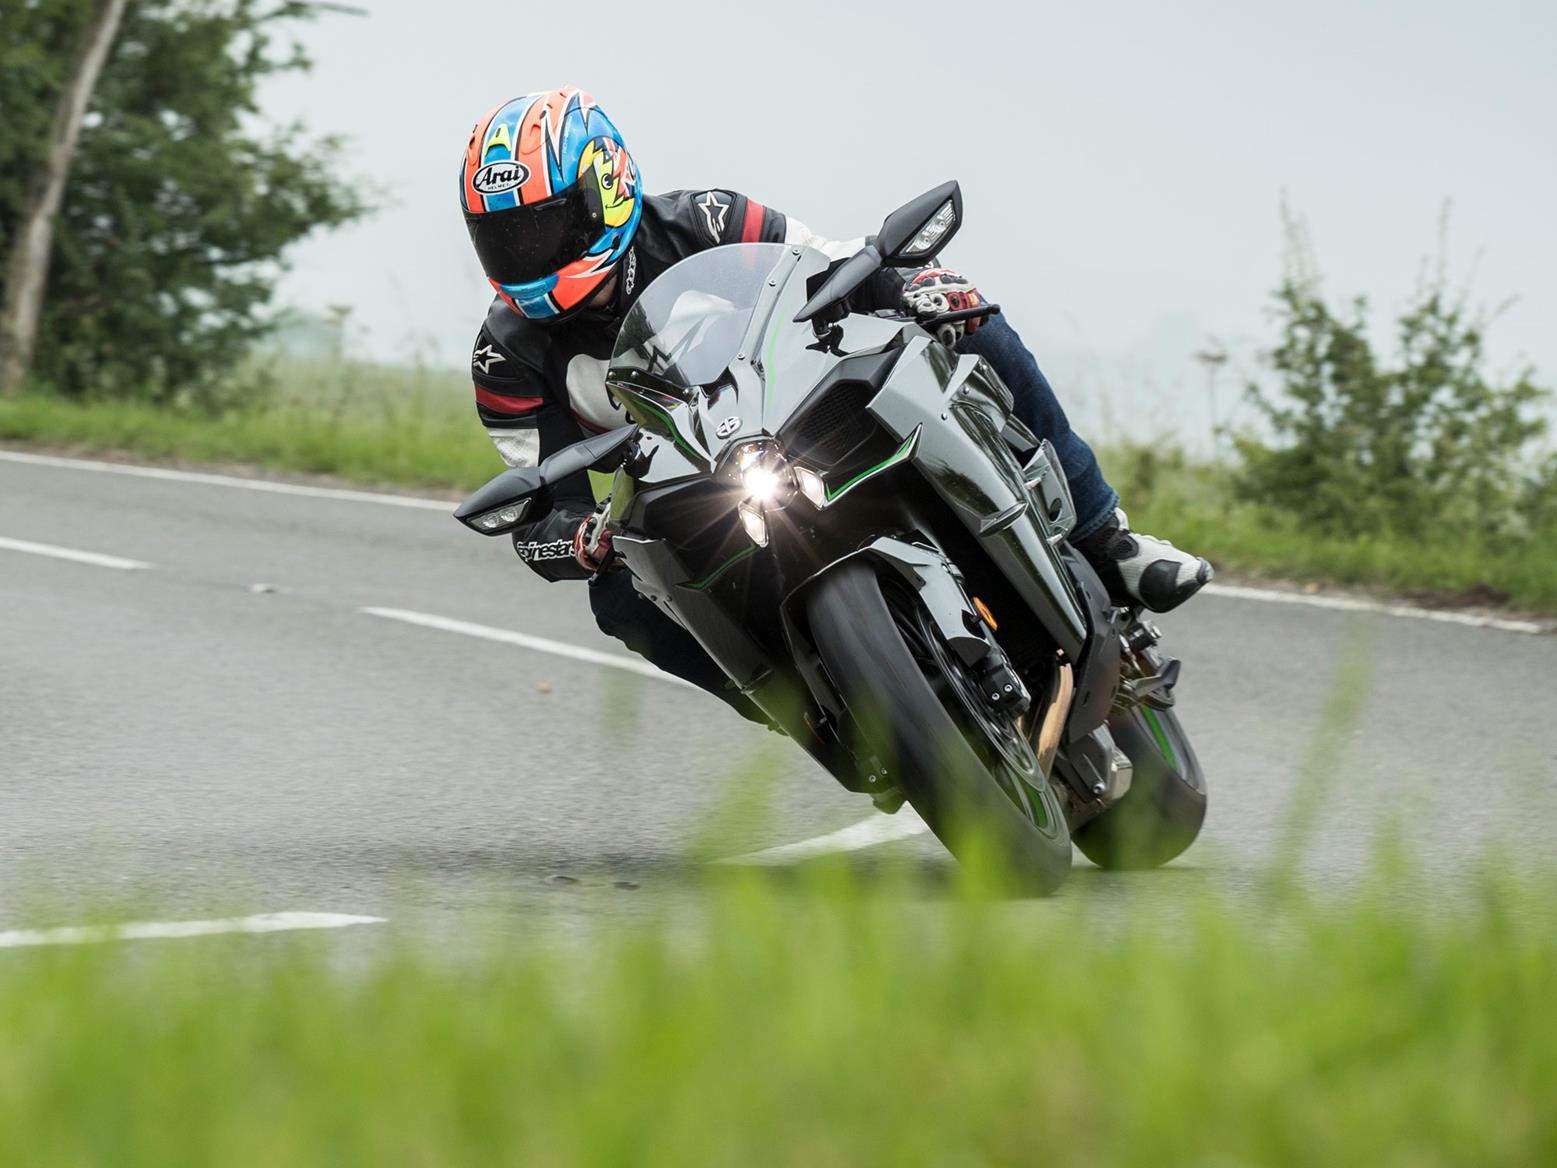 Kawasaki Ninja H2 cornering